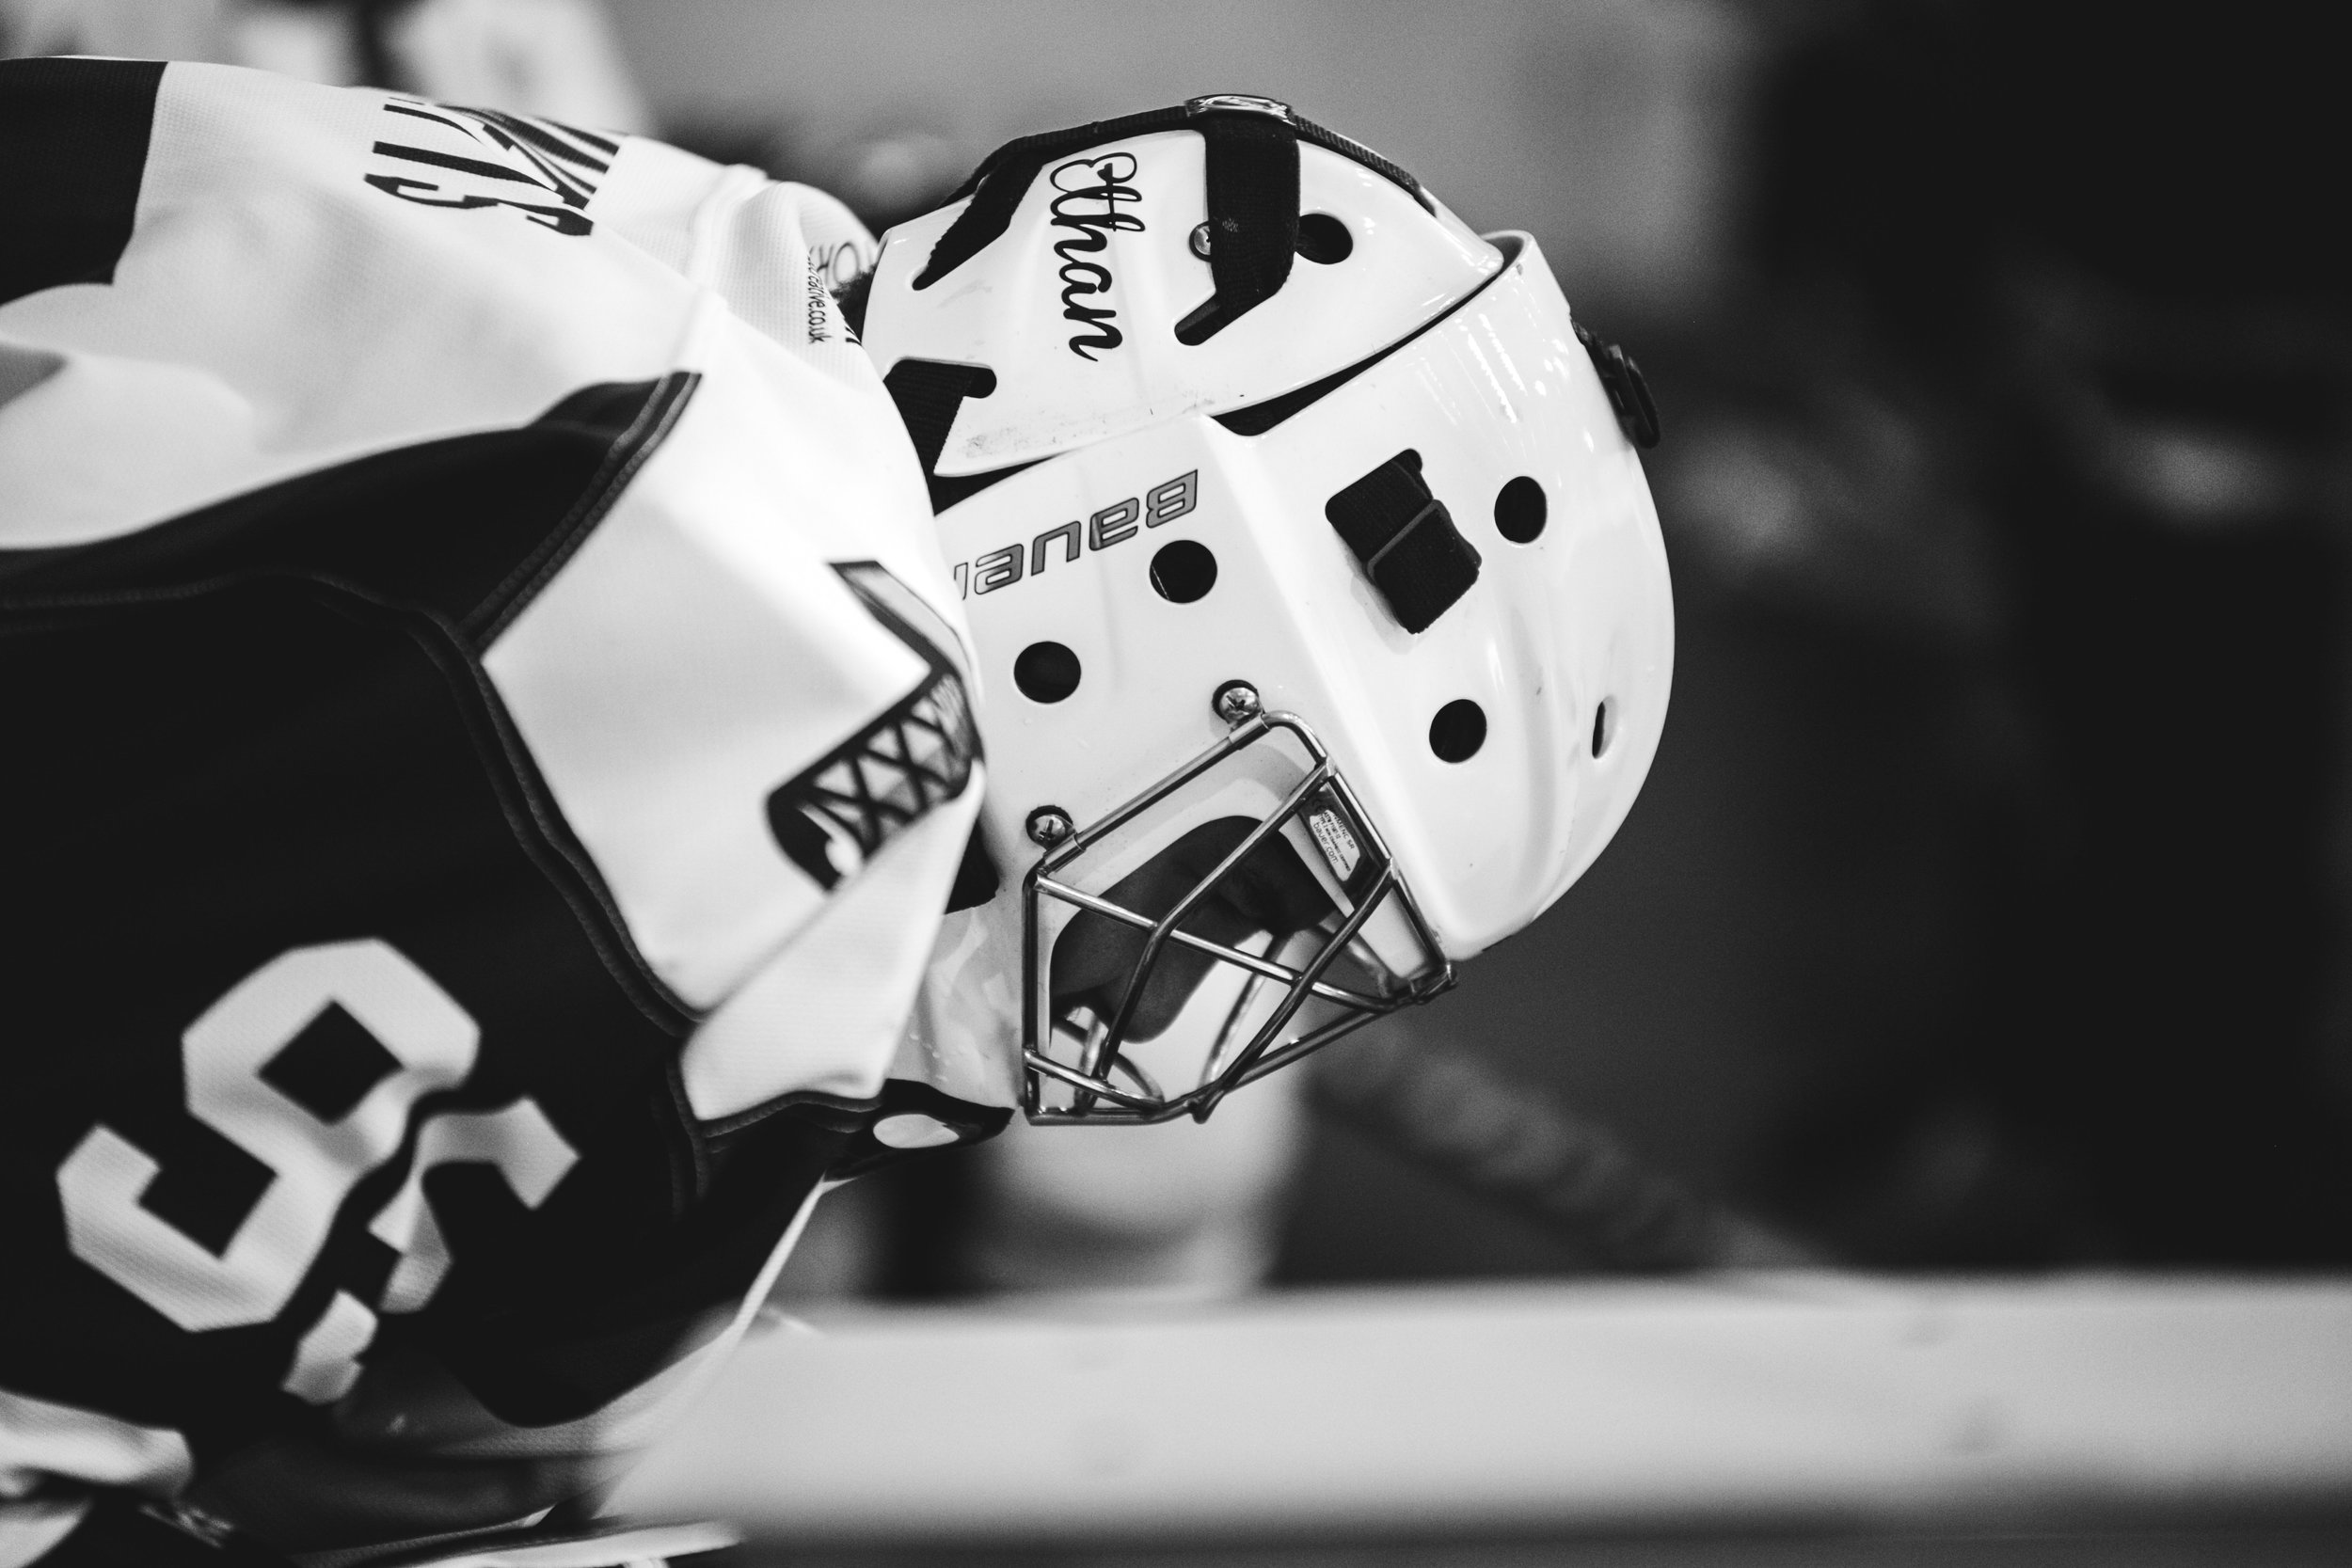 A hockey player wearing a helmet